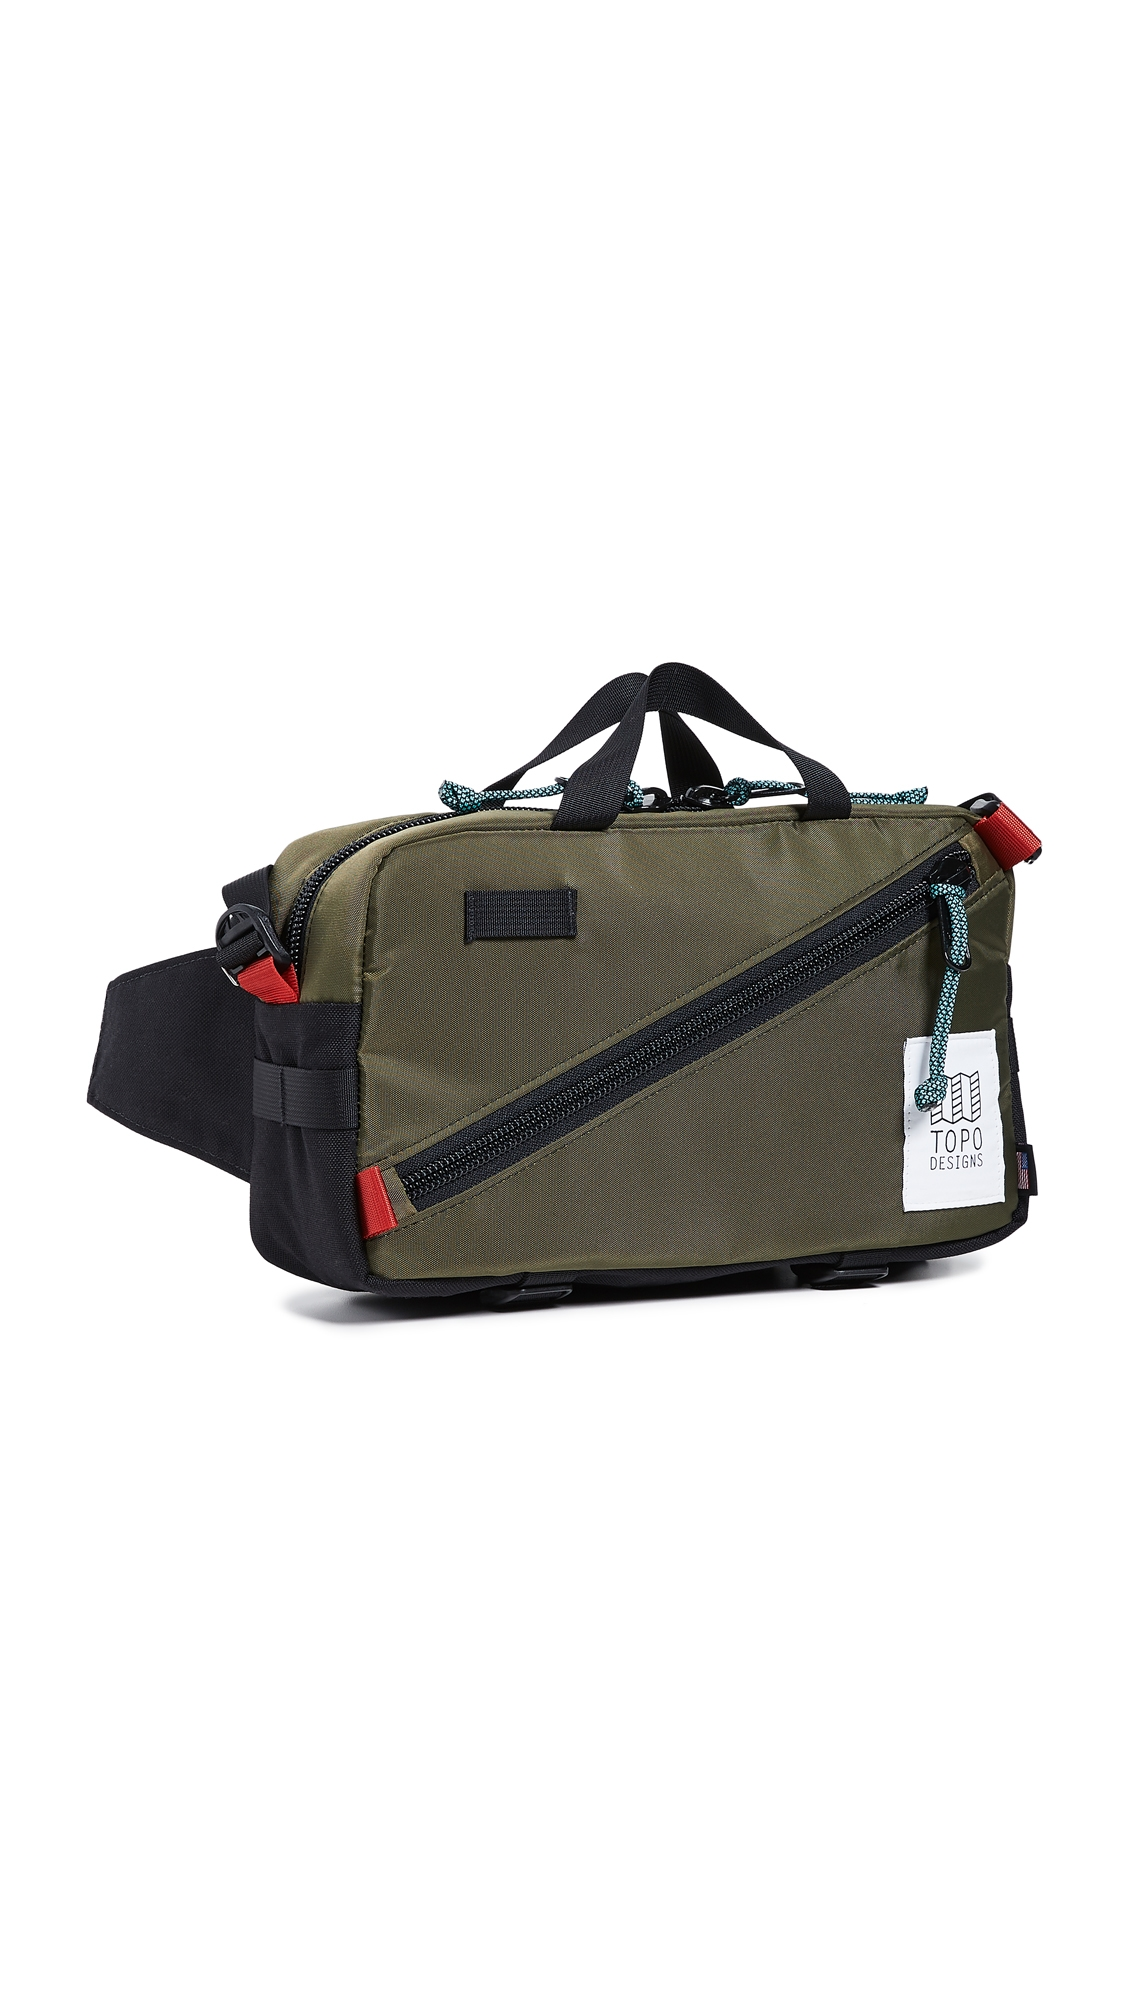 Topo Designs Bags QUICK PACK